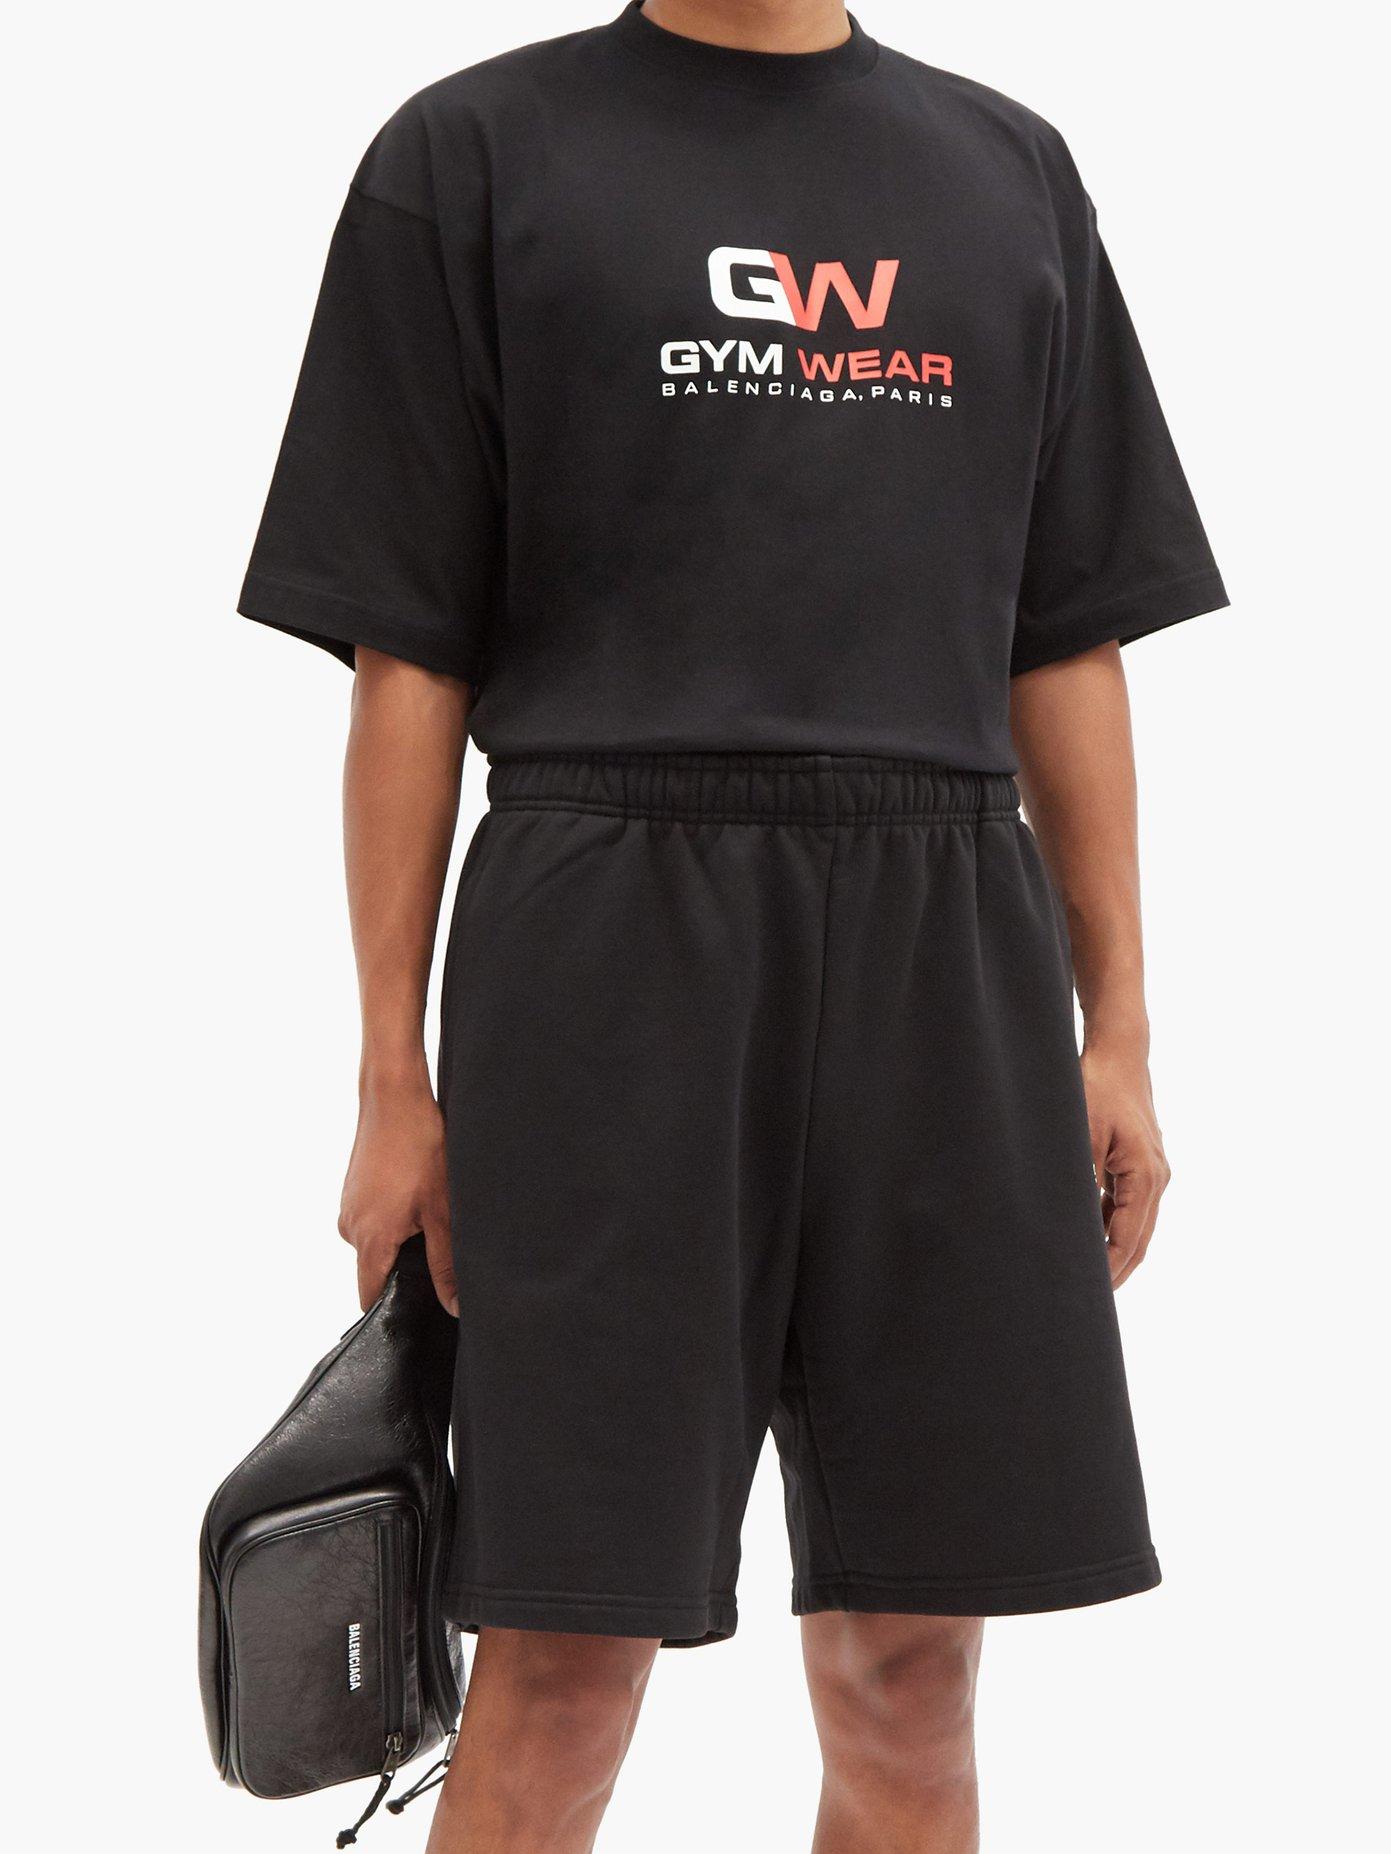 BALENCIAGA Cottons Gym Wear-print cotton-jersey T-shirt